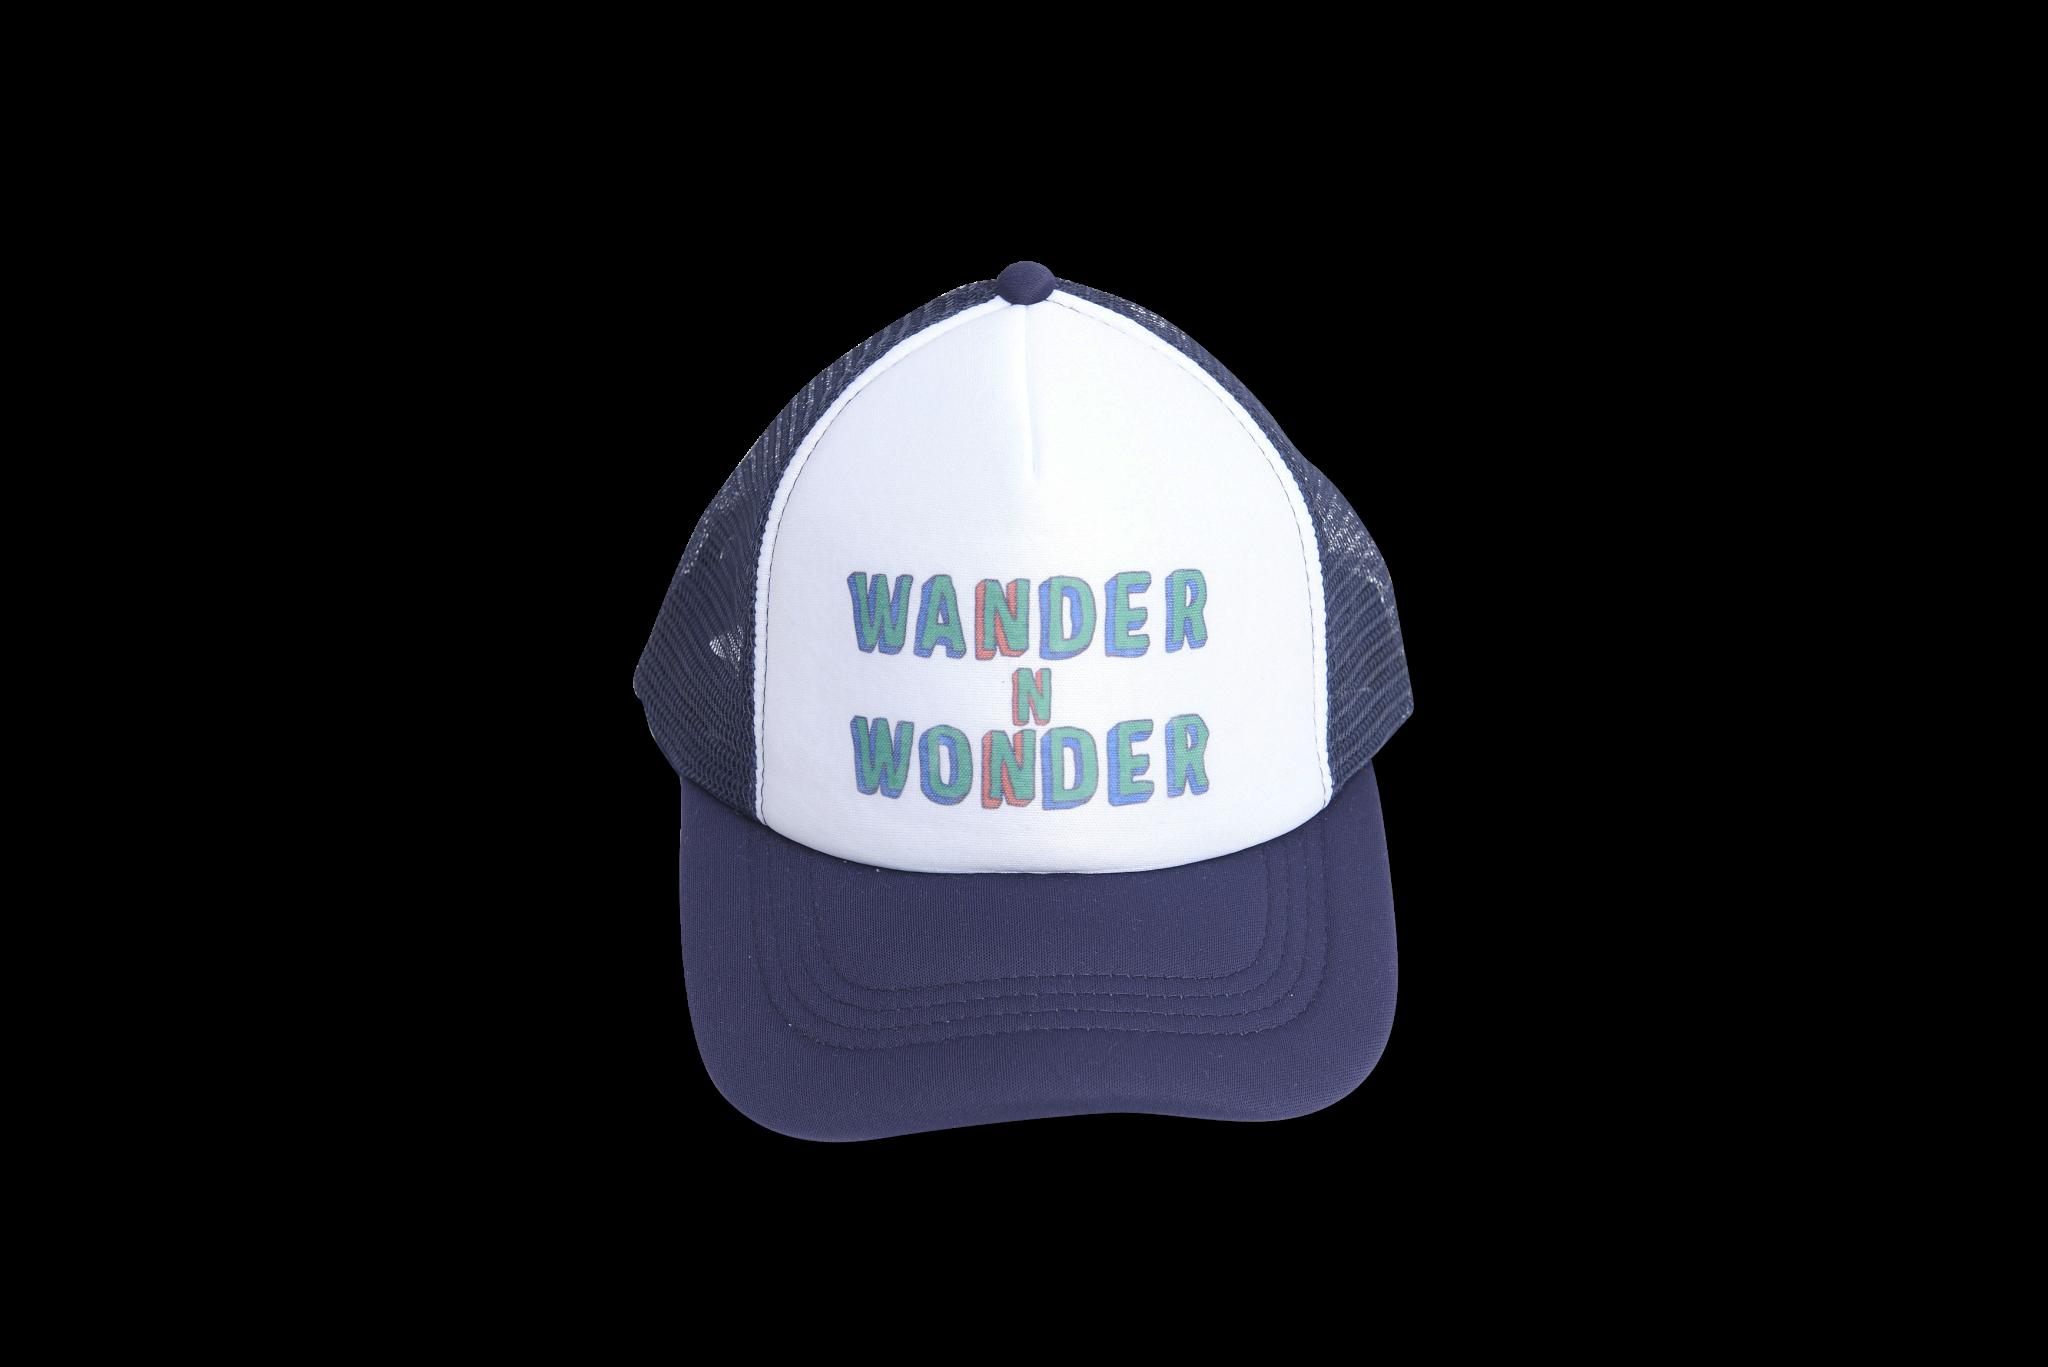 Wander & Wonder Trucker Cap | Navy blue